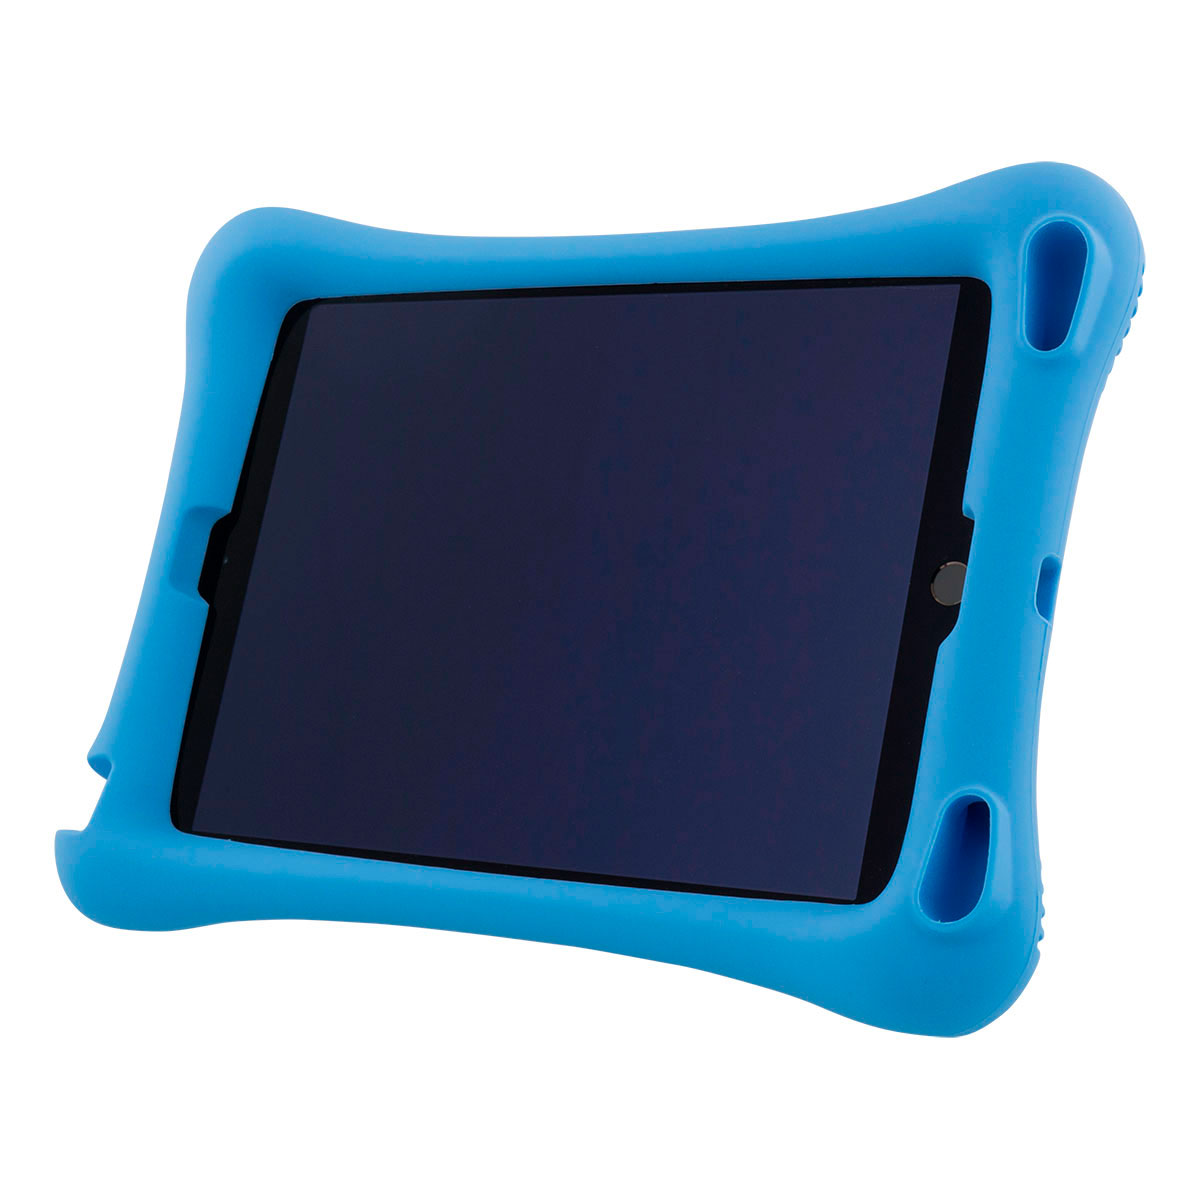 Børnecover til iPad Air 2Pro 9,7tm (Silikone) Blå